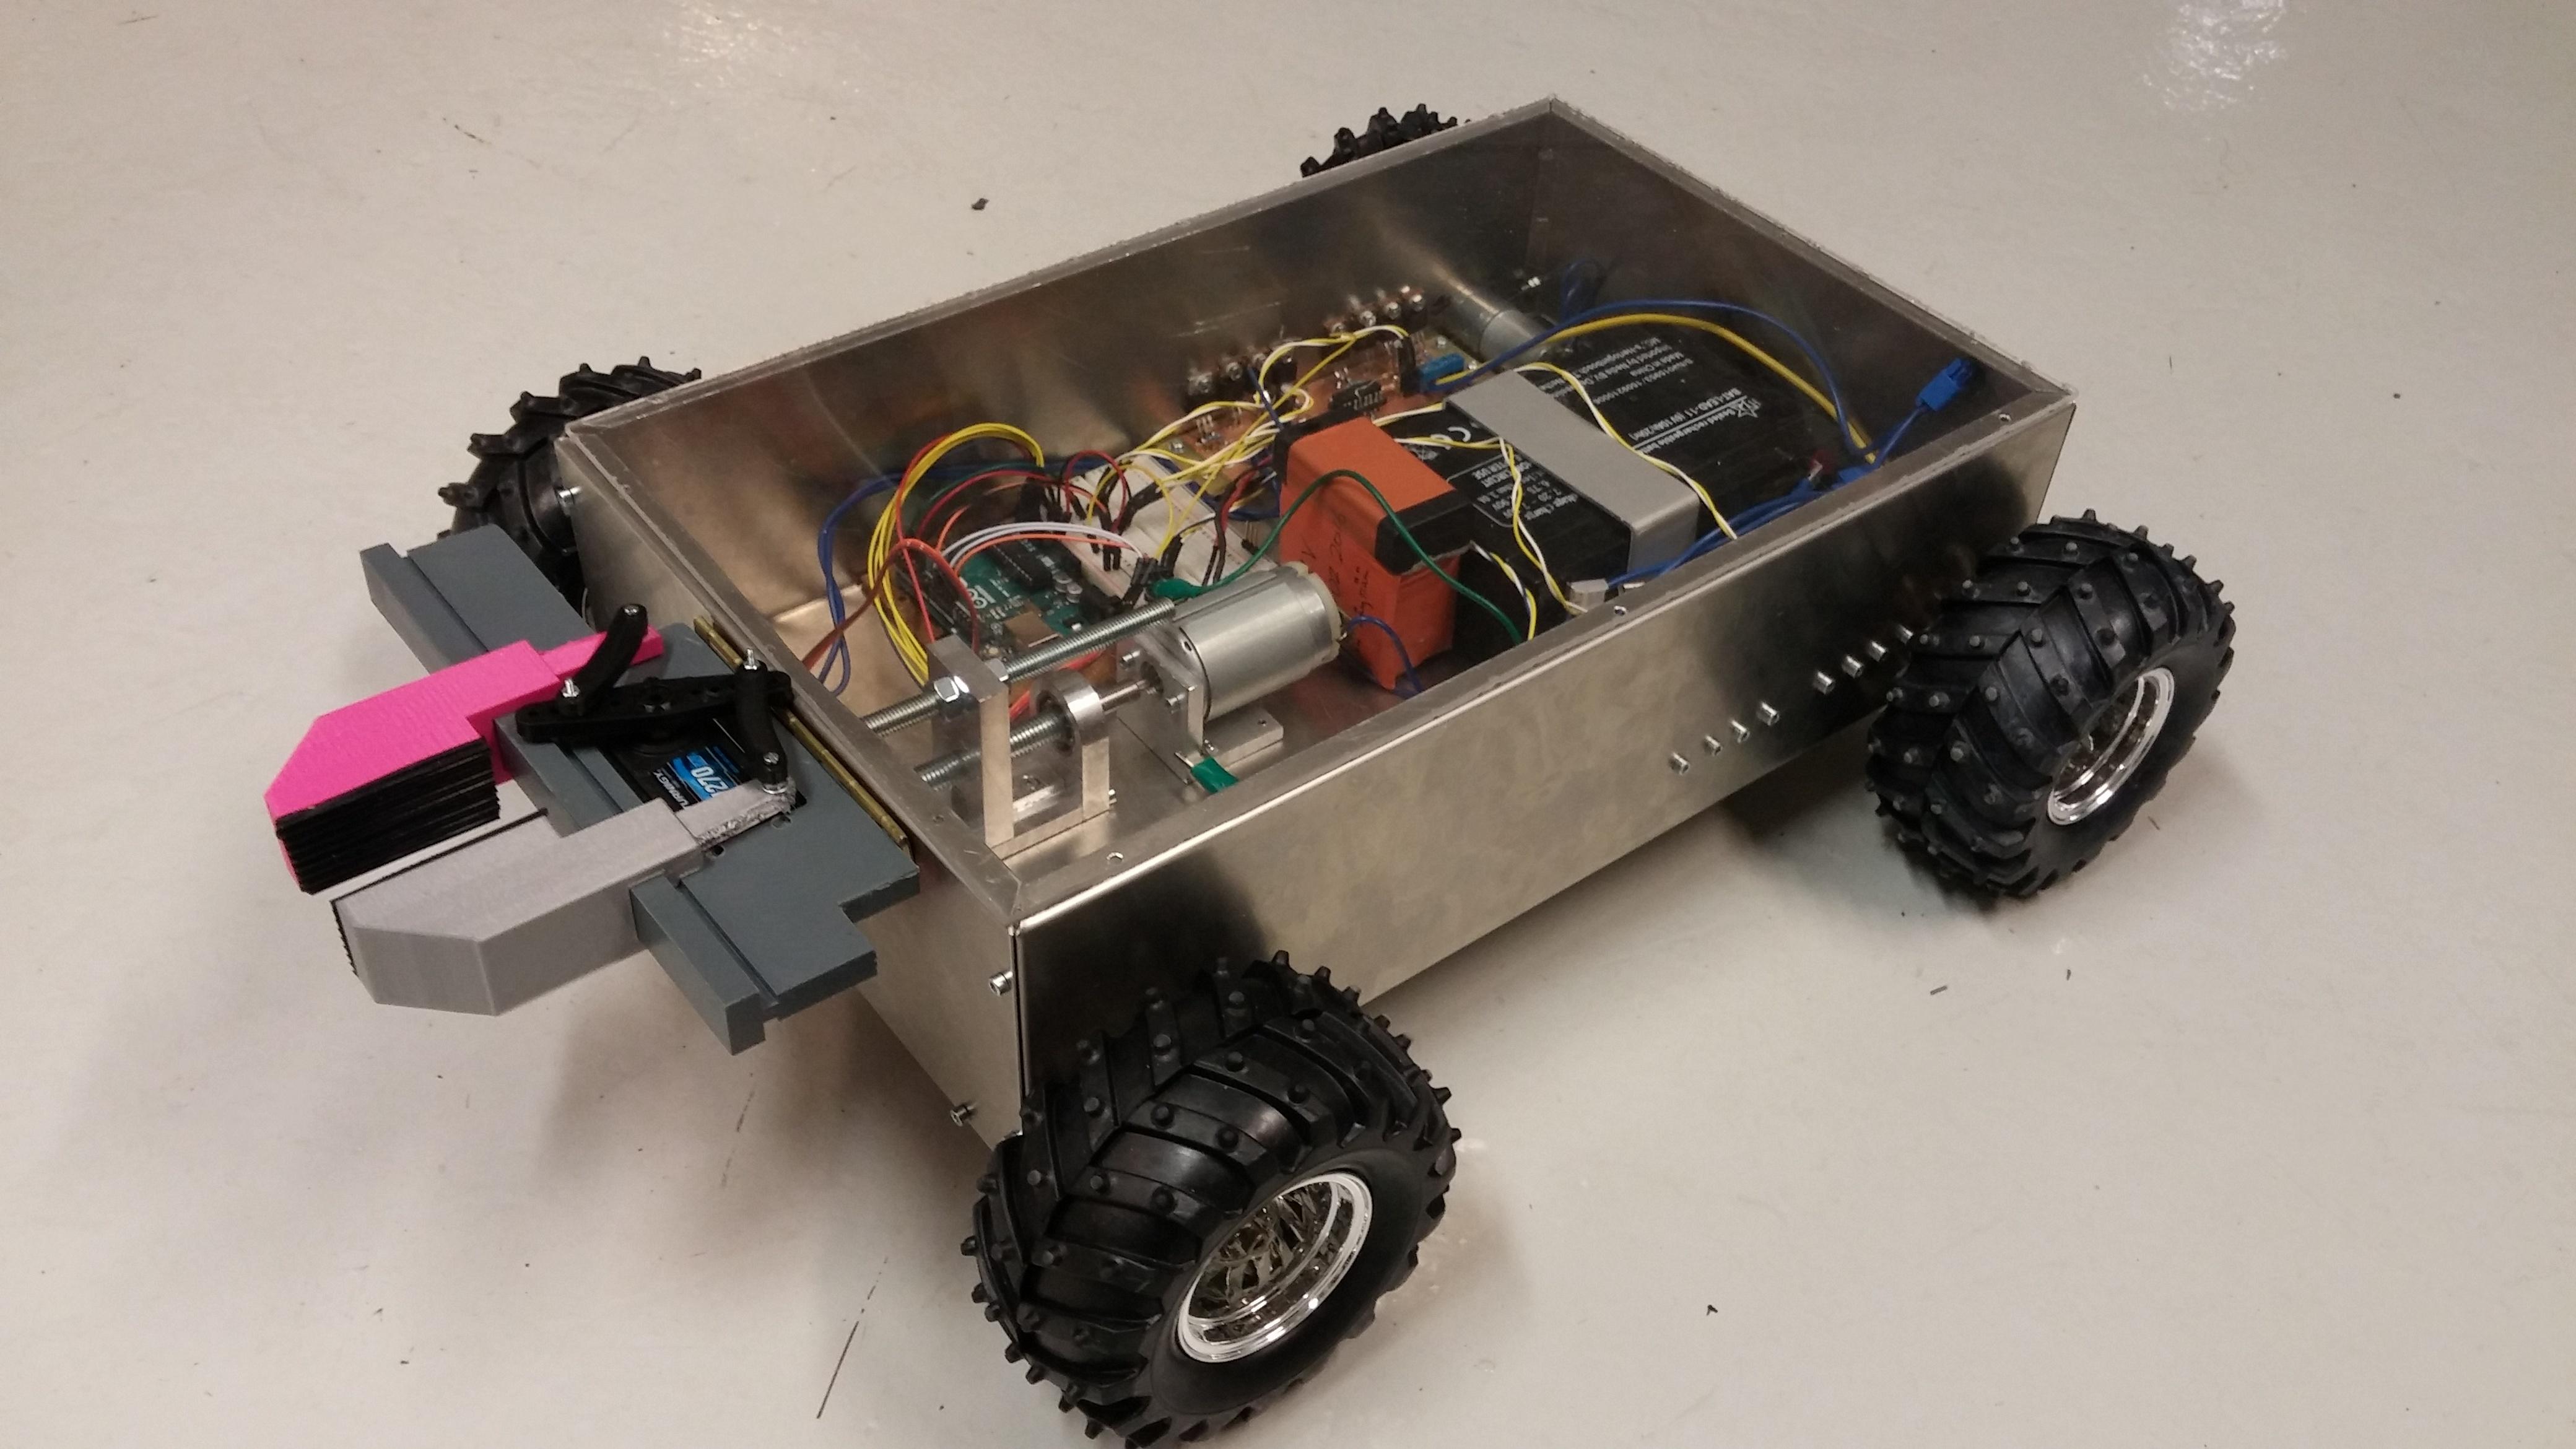 Noutaja 9000 - Autonomous differential photosensor array